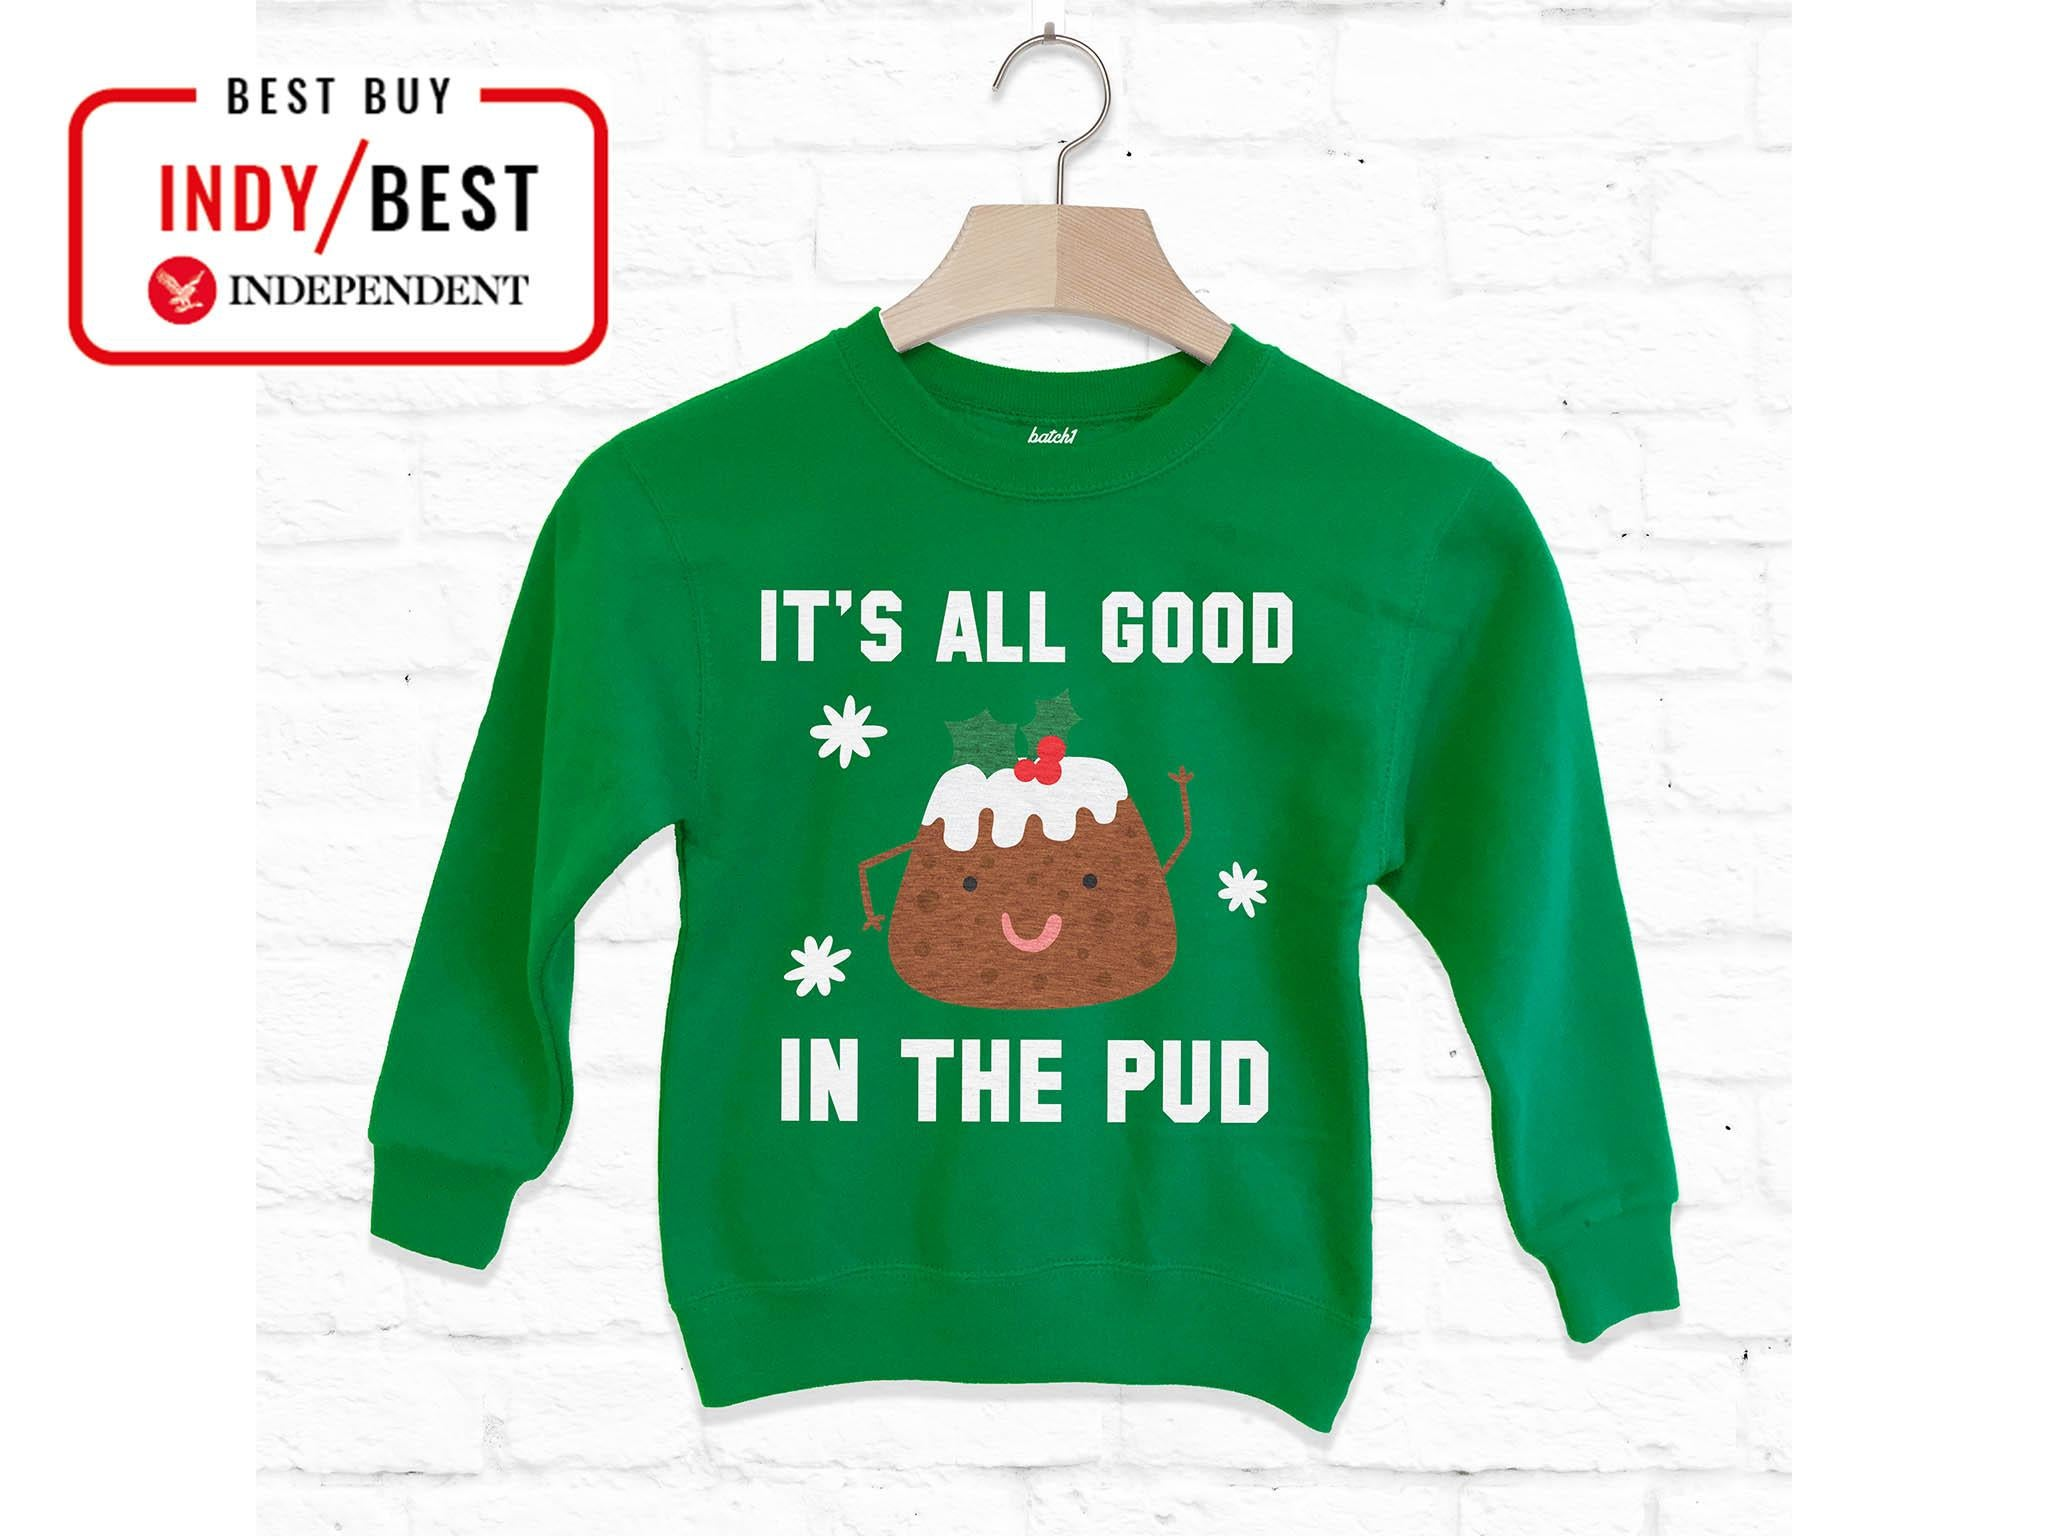 Christmas Boys /& Girls Little Pudding Festive Sweater Jumper